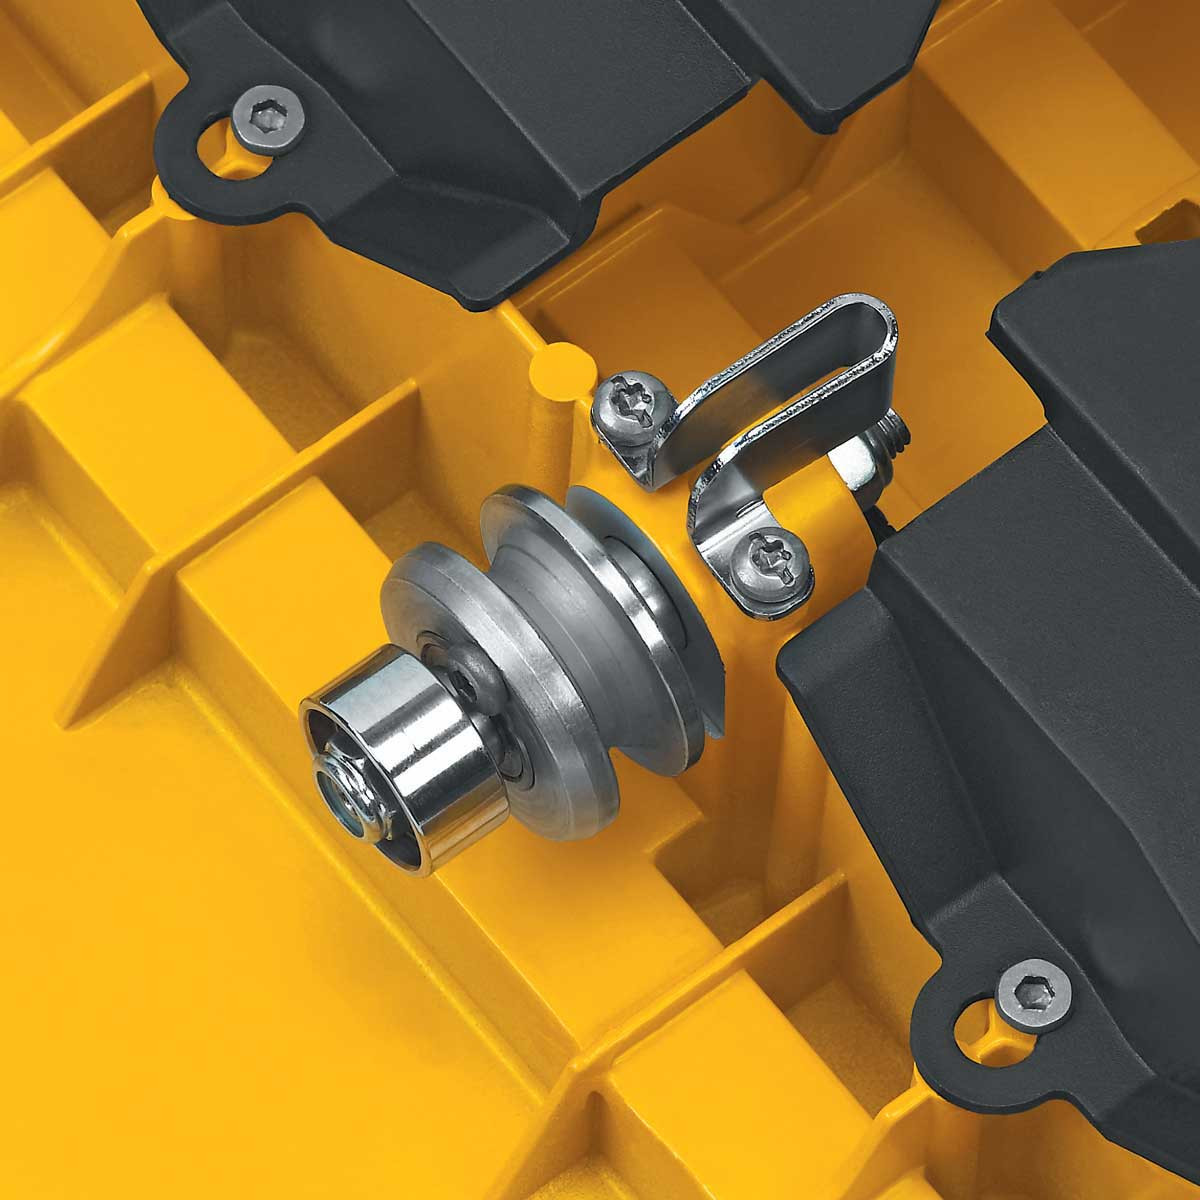 Dewalt D24000 roller and bearings